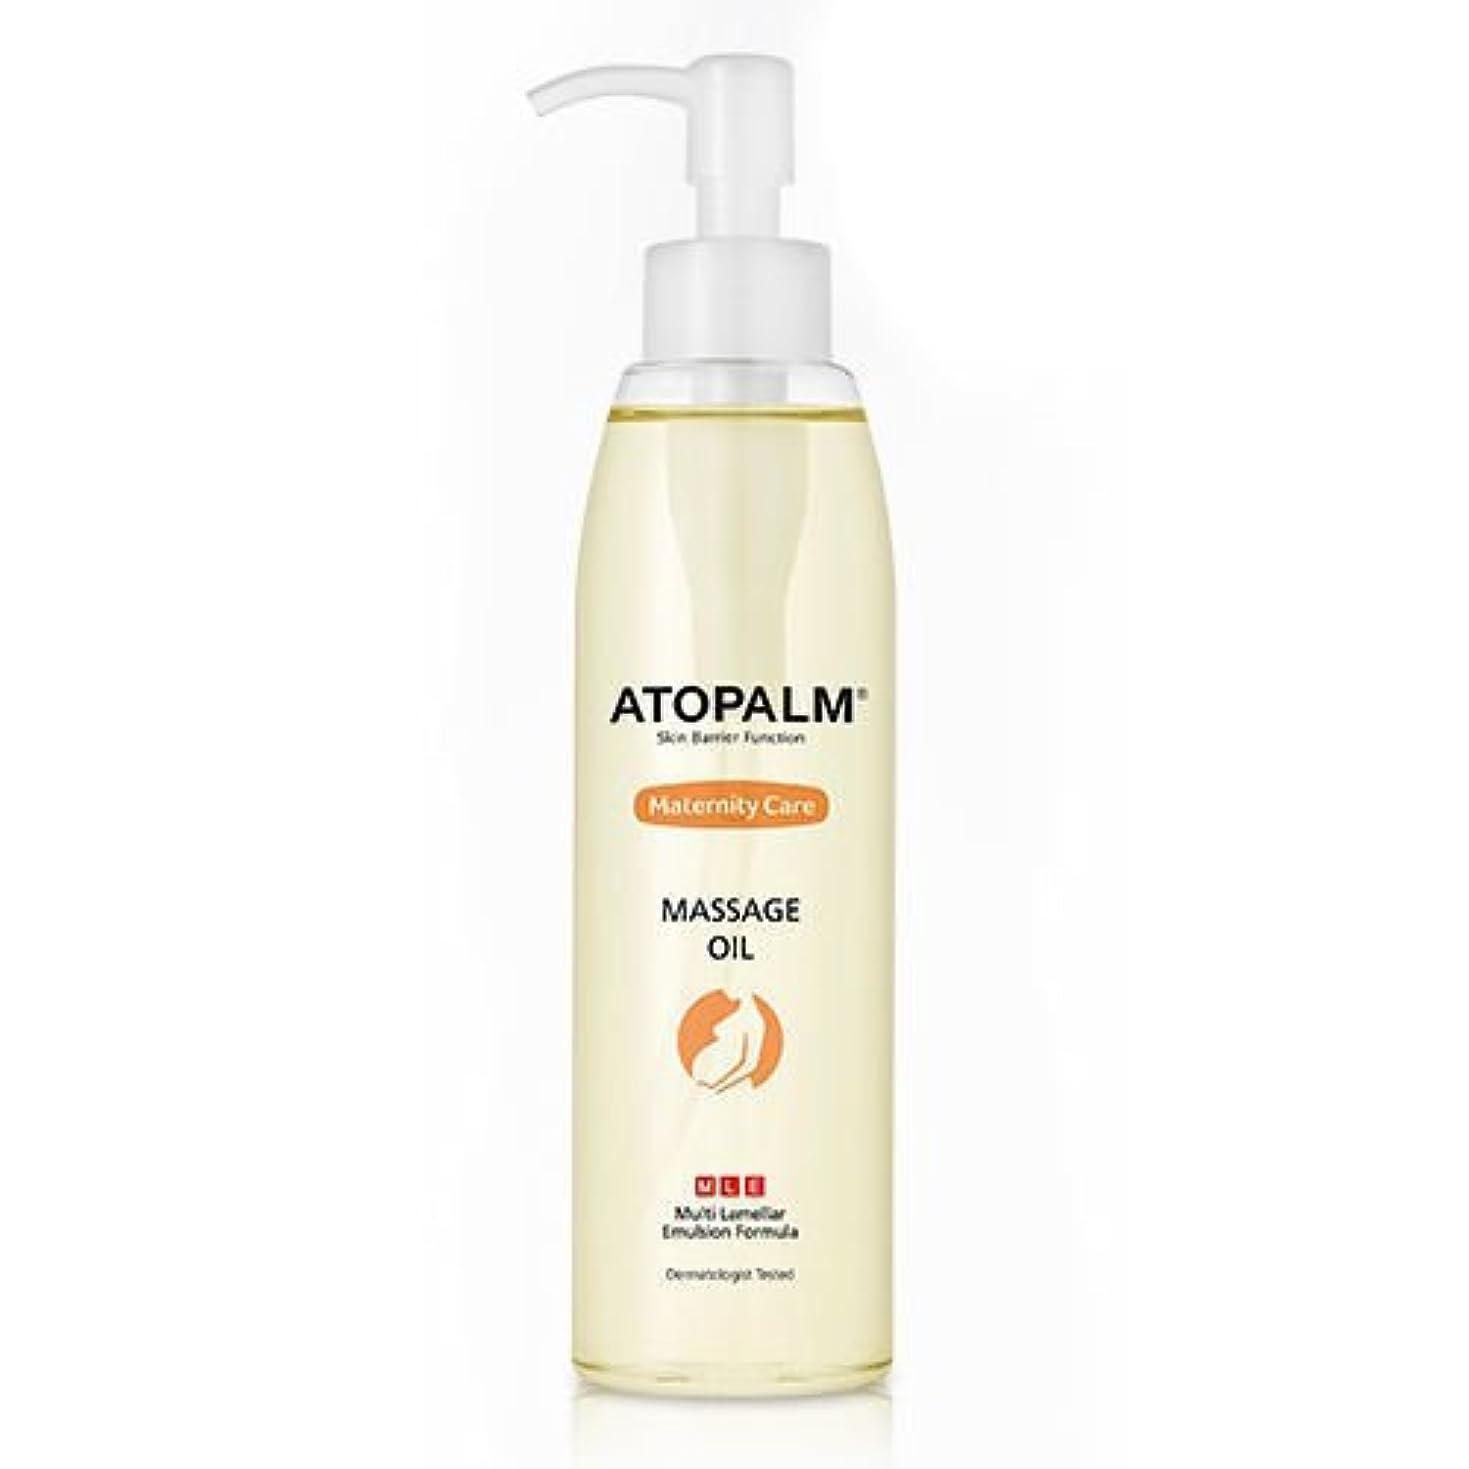 ATOPALM Maternity Care Massage Oil 120ml/アトパーム マタニティ ケア マッサージ オイル 120ml [並行輸入品]